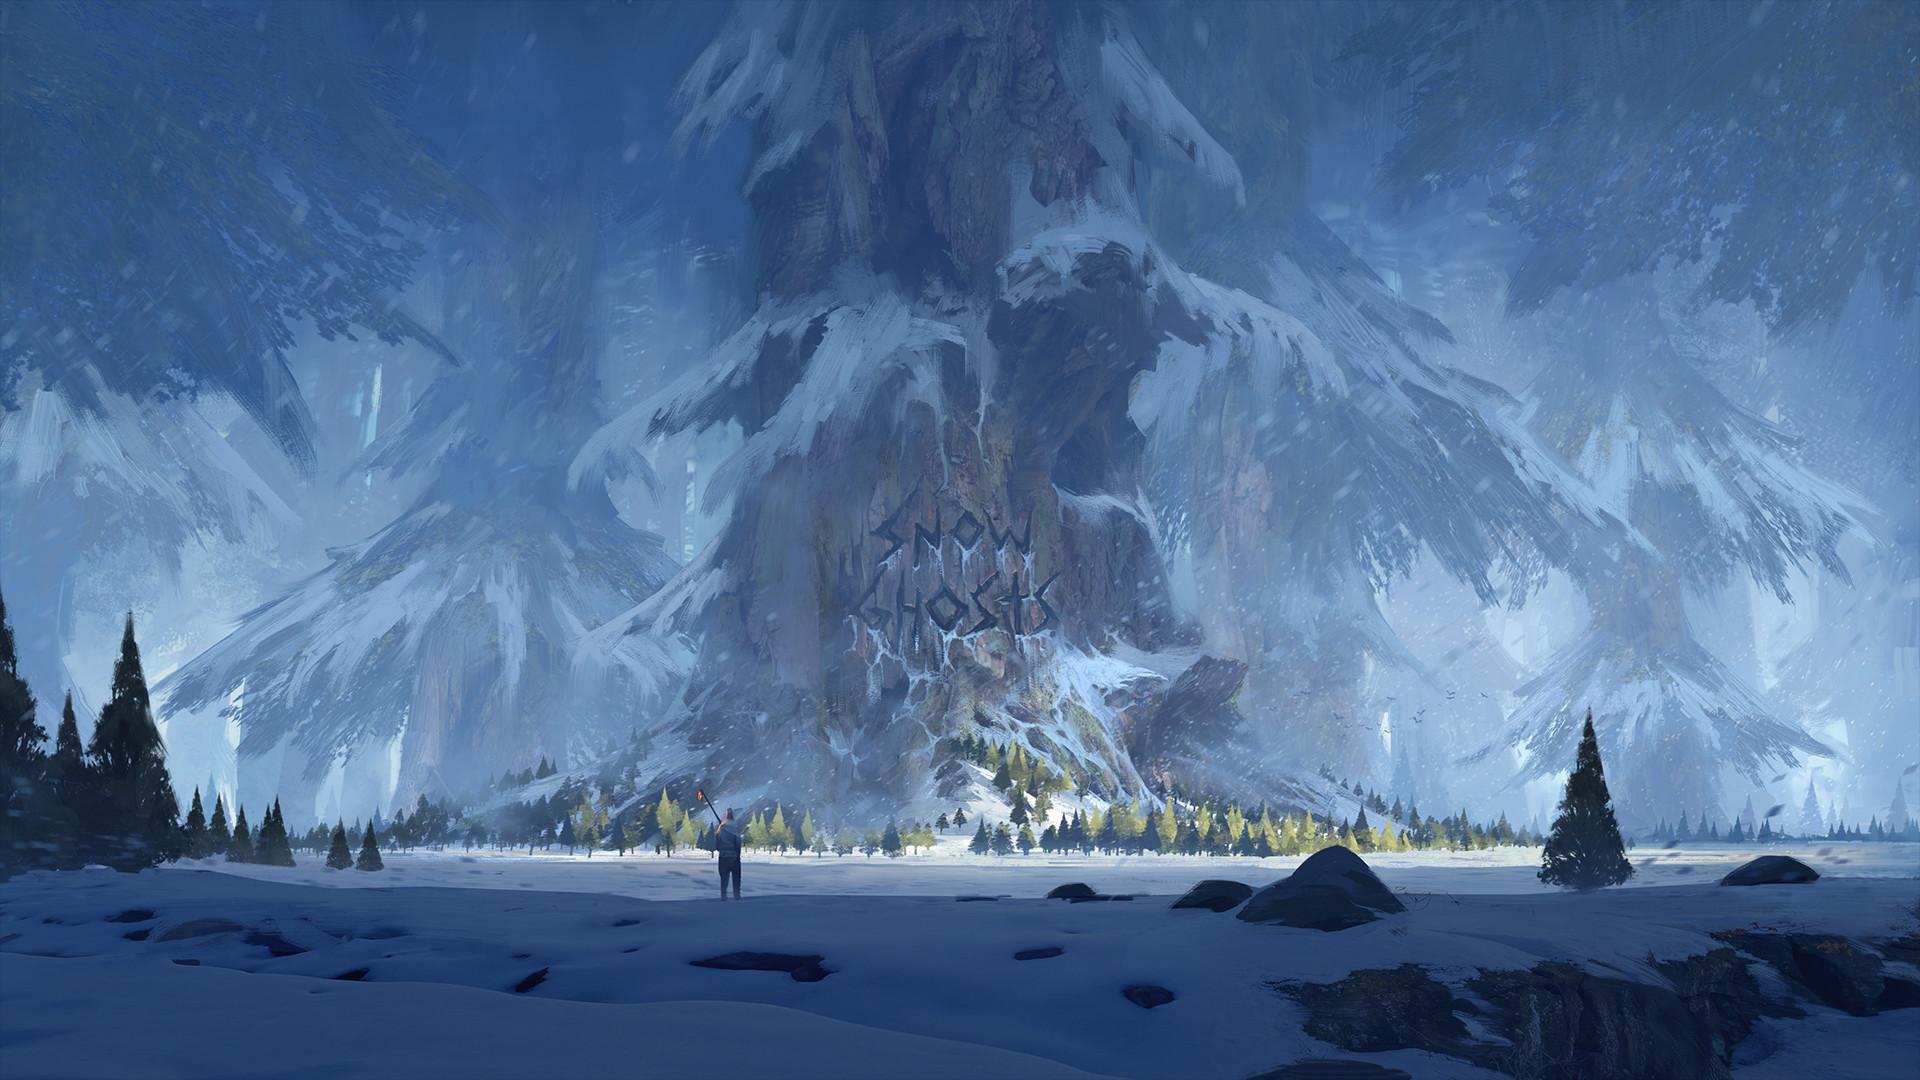 MrSuicideSheep – Snow Ghosts by tsonline MrSuicideSheep – Snow Ghosts by  tsonline